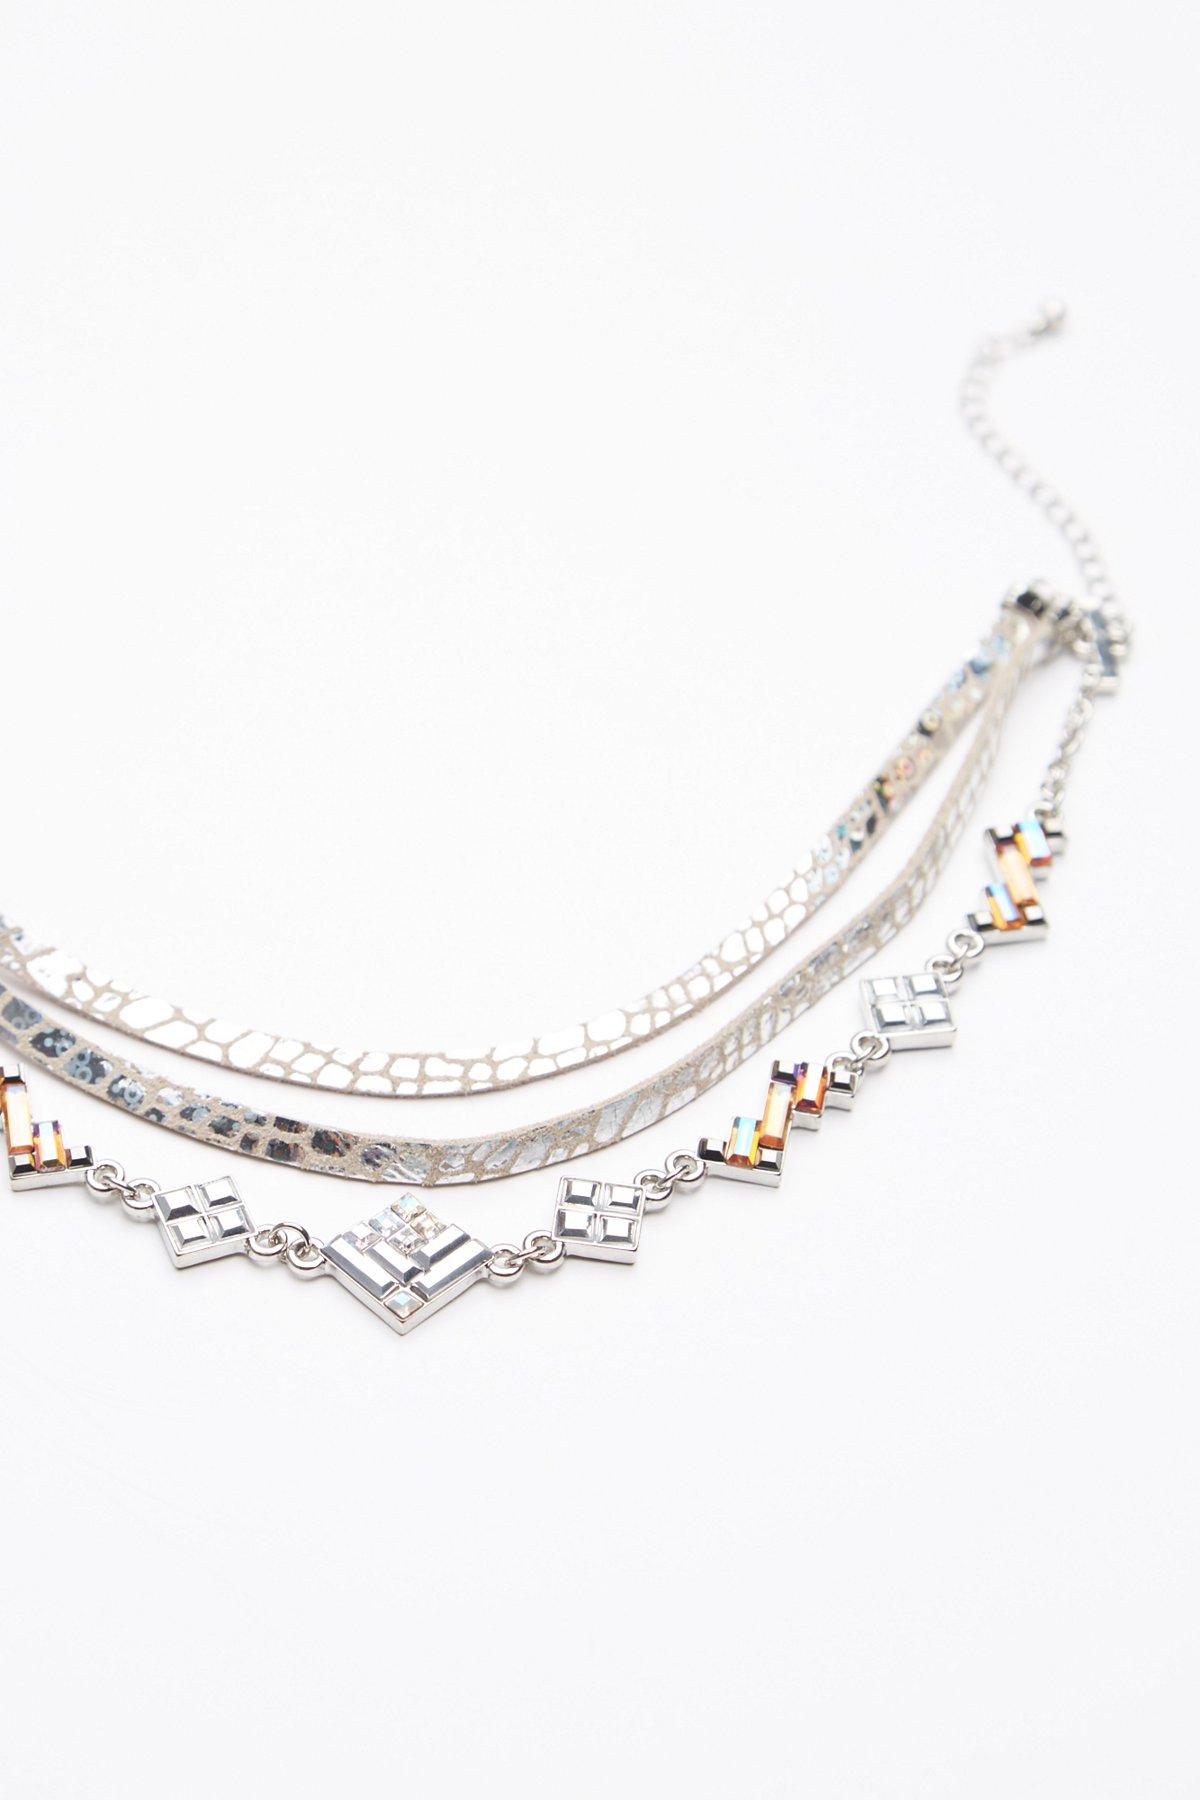 Luna装饰缠绕式皮革颈链